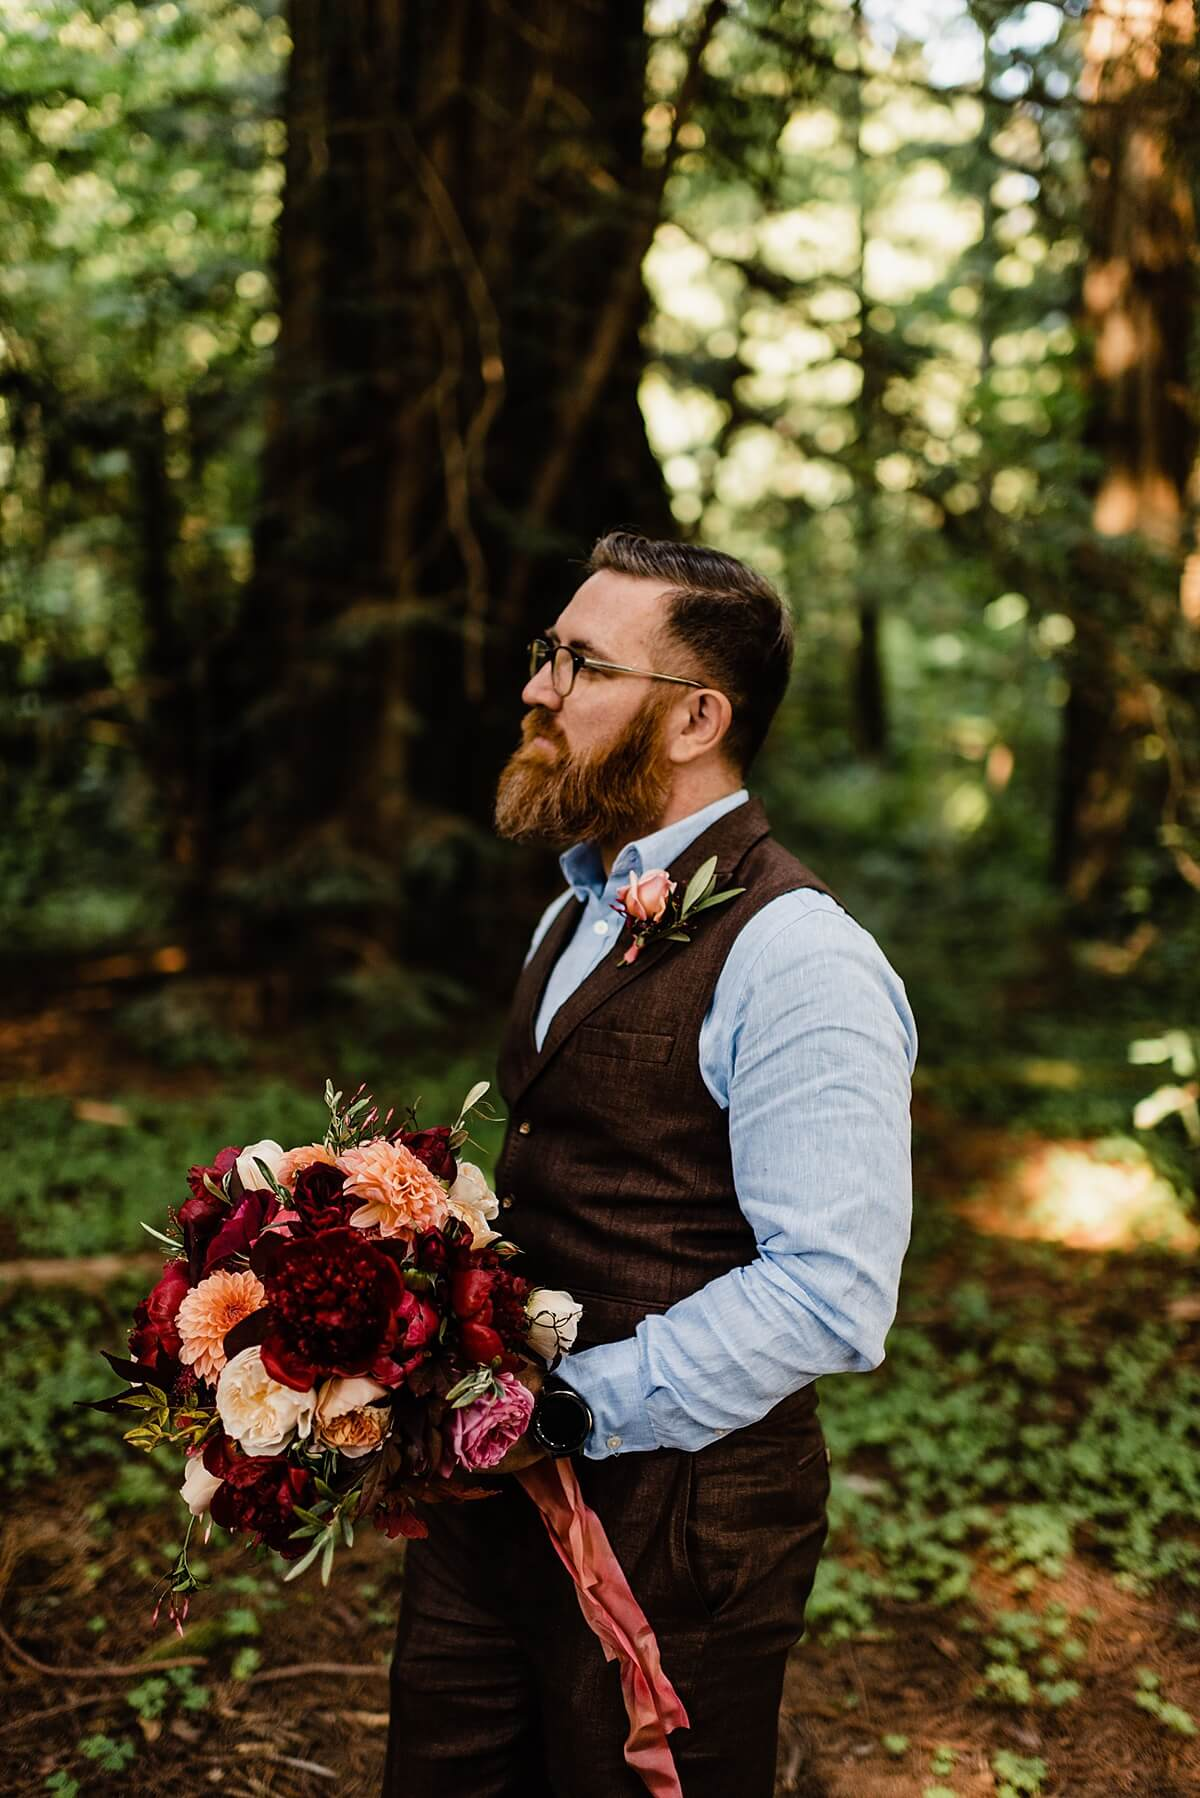 Allison-Brooks-Jedediah-Smiith-Redwoods-Adventure-Elopement-Wedding-S-Photography-Blog_0052.jpg